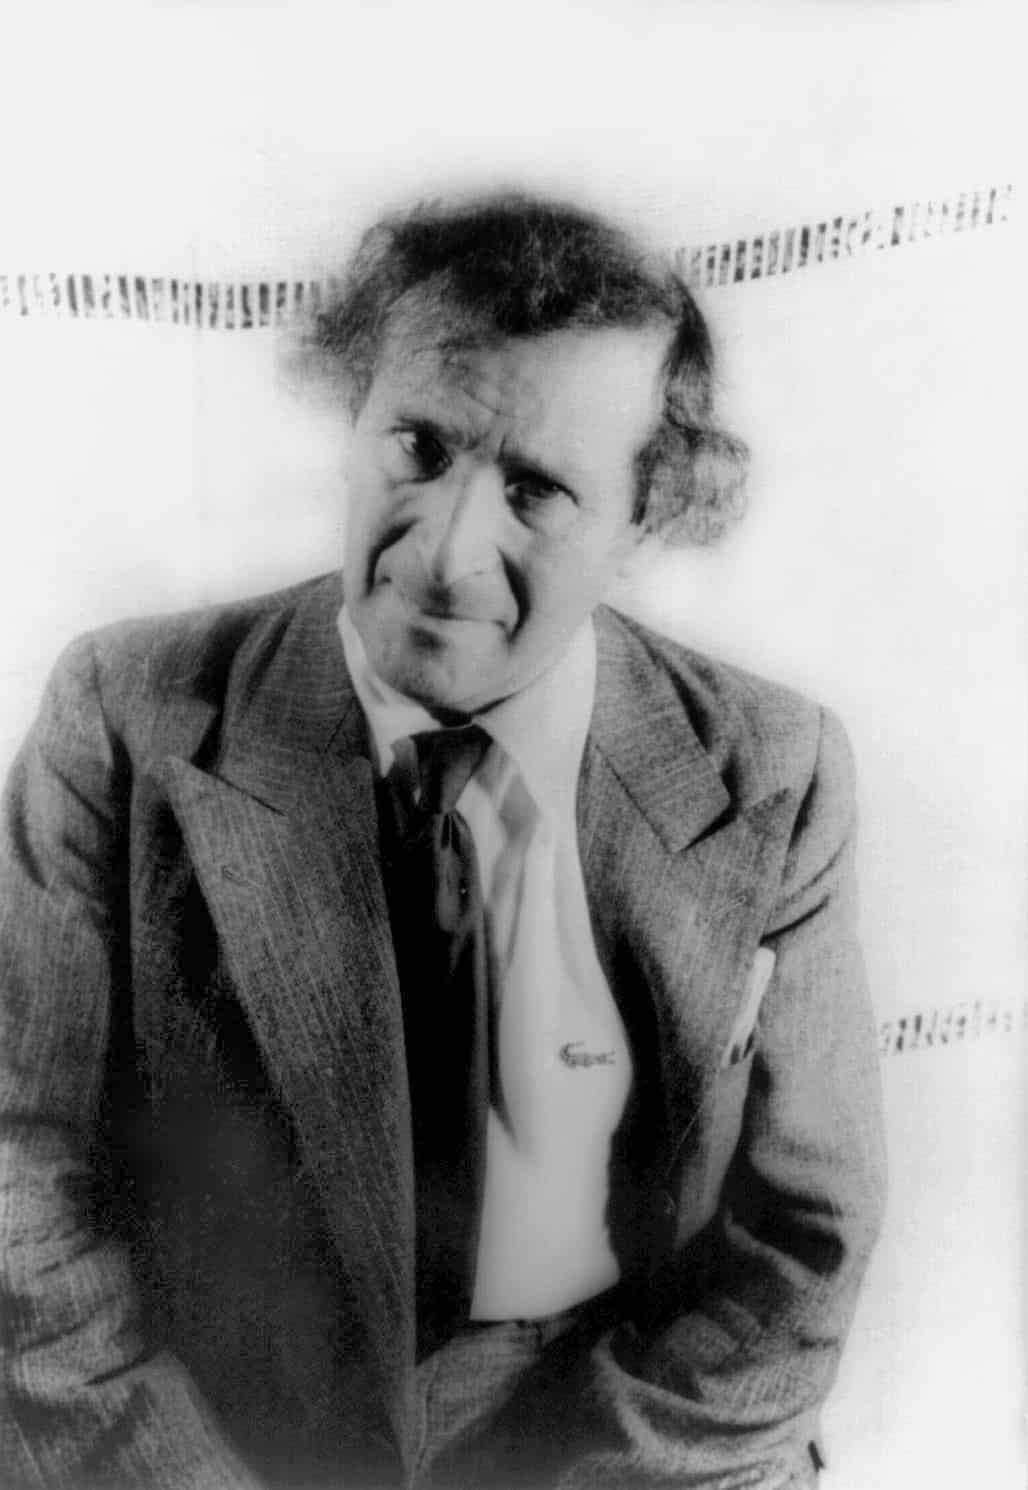 Marc Chagall (1887 – 1985)